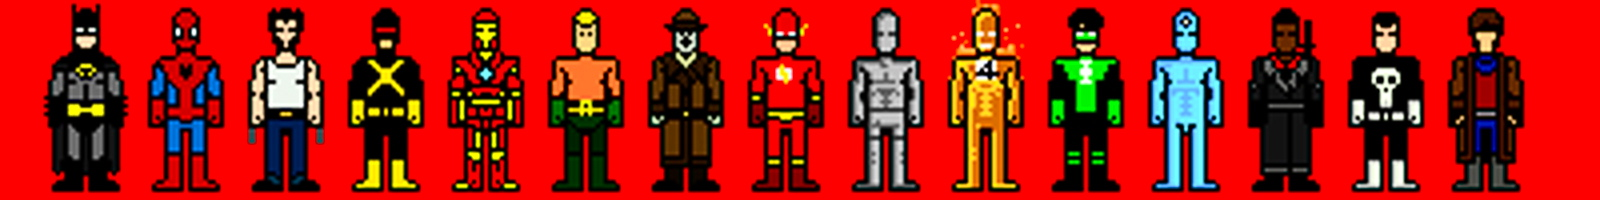 pixelated super heroes